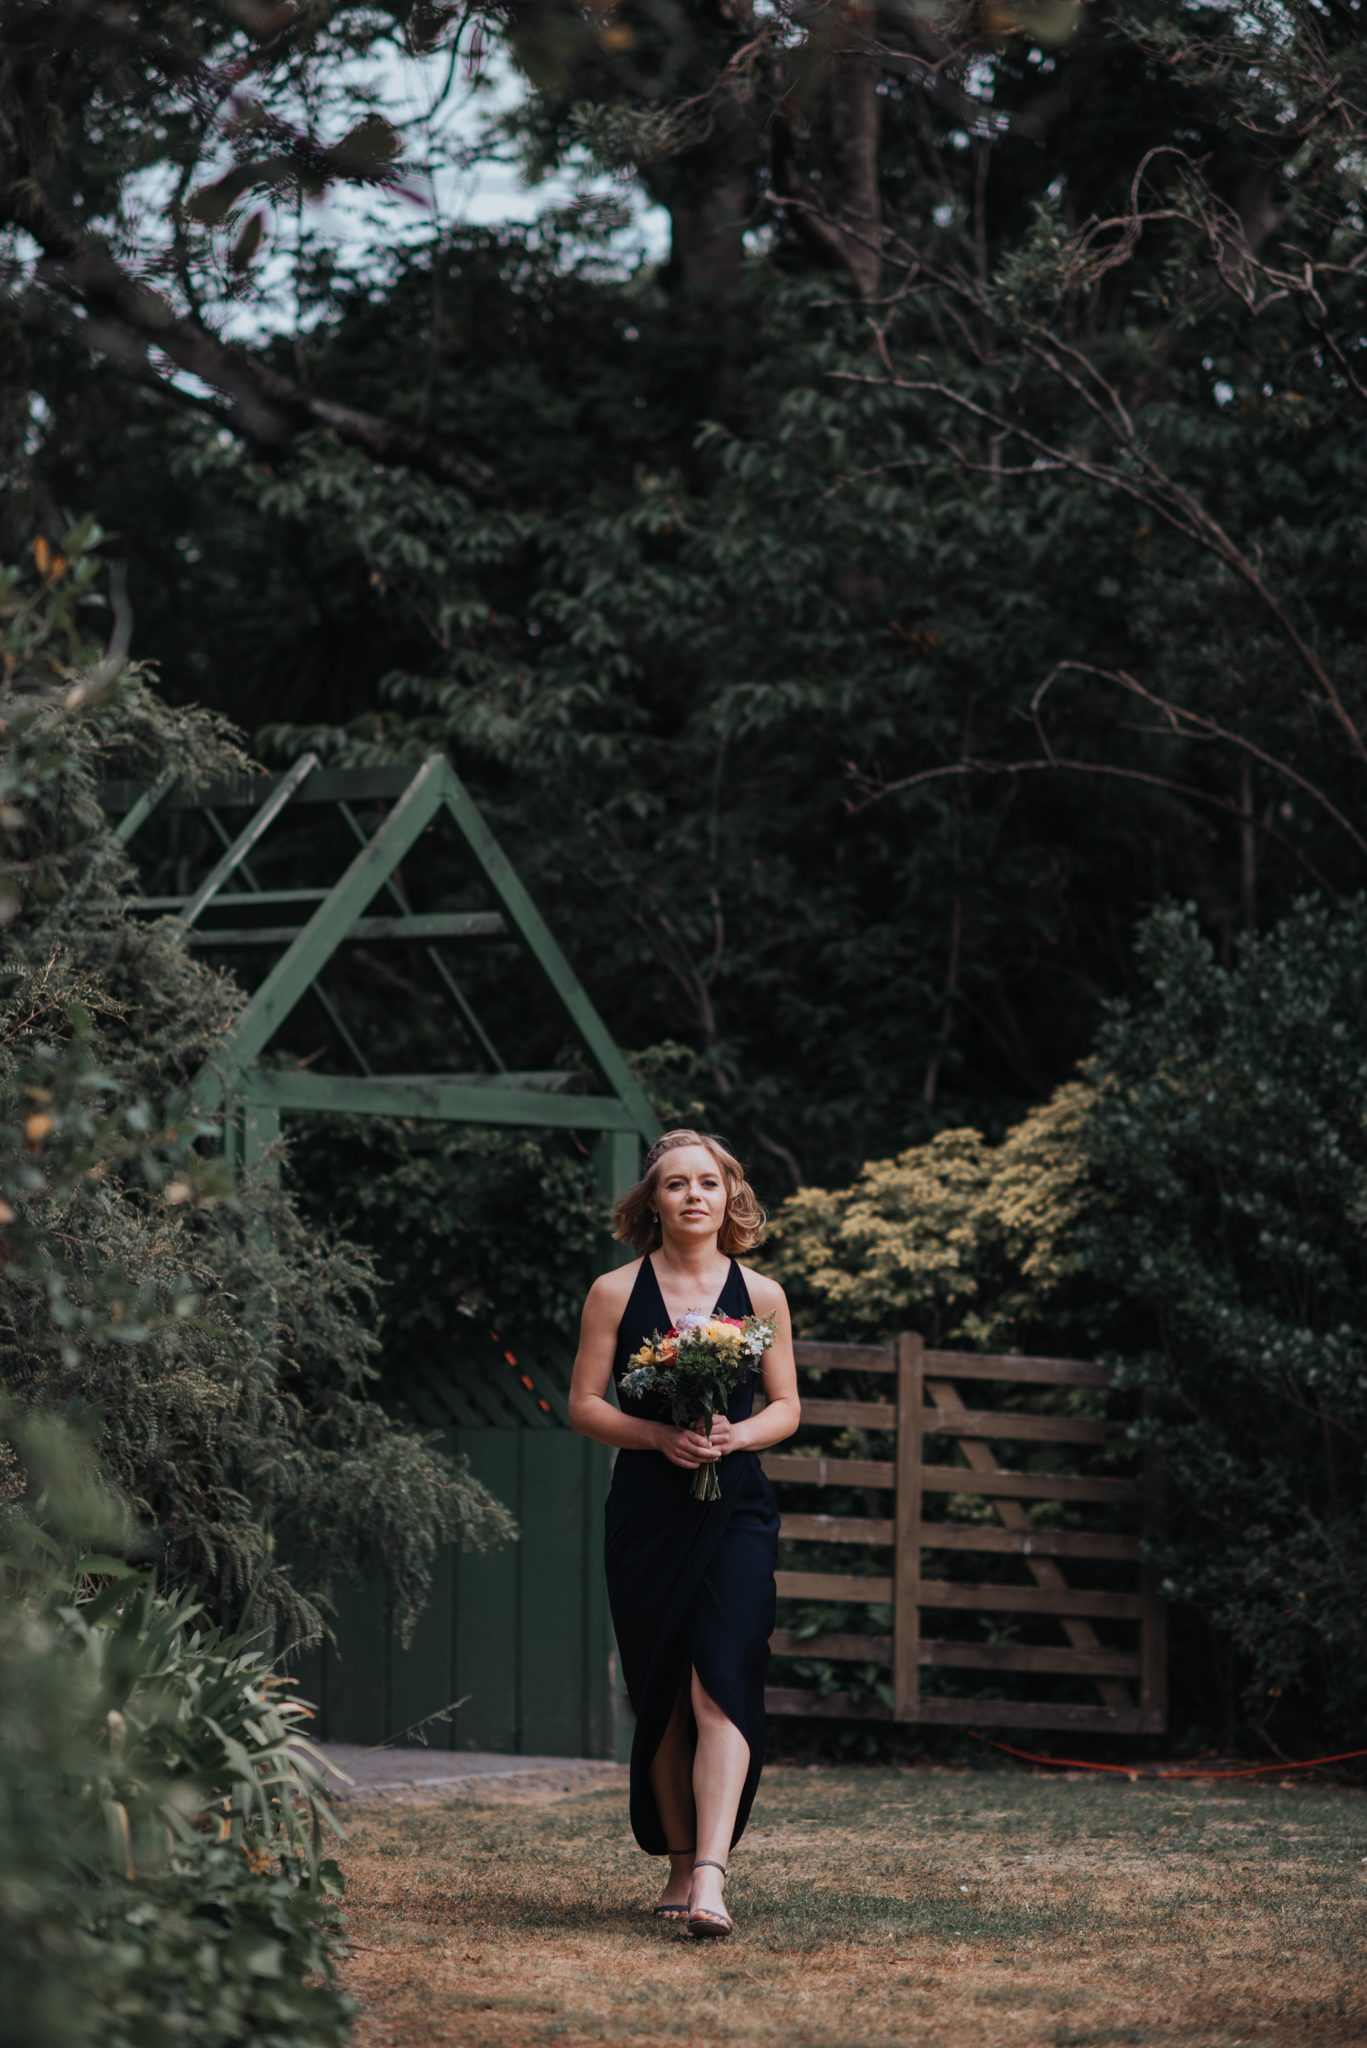 LOVELENSCAPES PHOTOGRAPHY • VISUAL POETRY • NEW ZEALAND WEDDING PHOTOGRAPHER • AUSTRALIAN WEDDING PHOTOGRAPHER • BRISBANE • MELBOURNE • SYDNEY • HOBART • TARUREKA ESTATE • ANNA CAMPBELL • 101.jpg